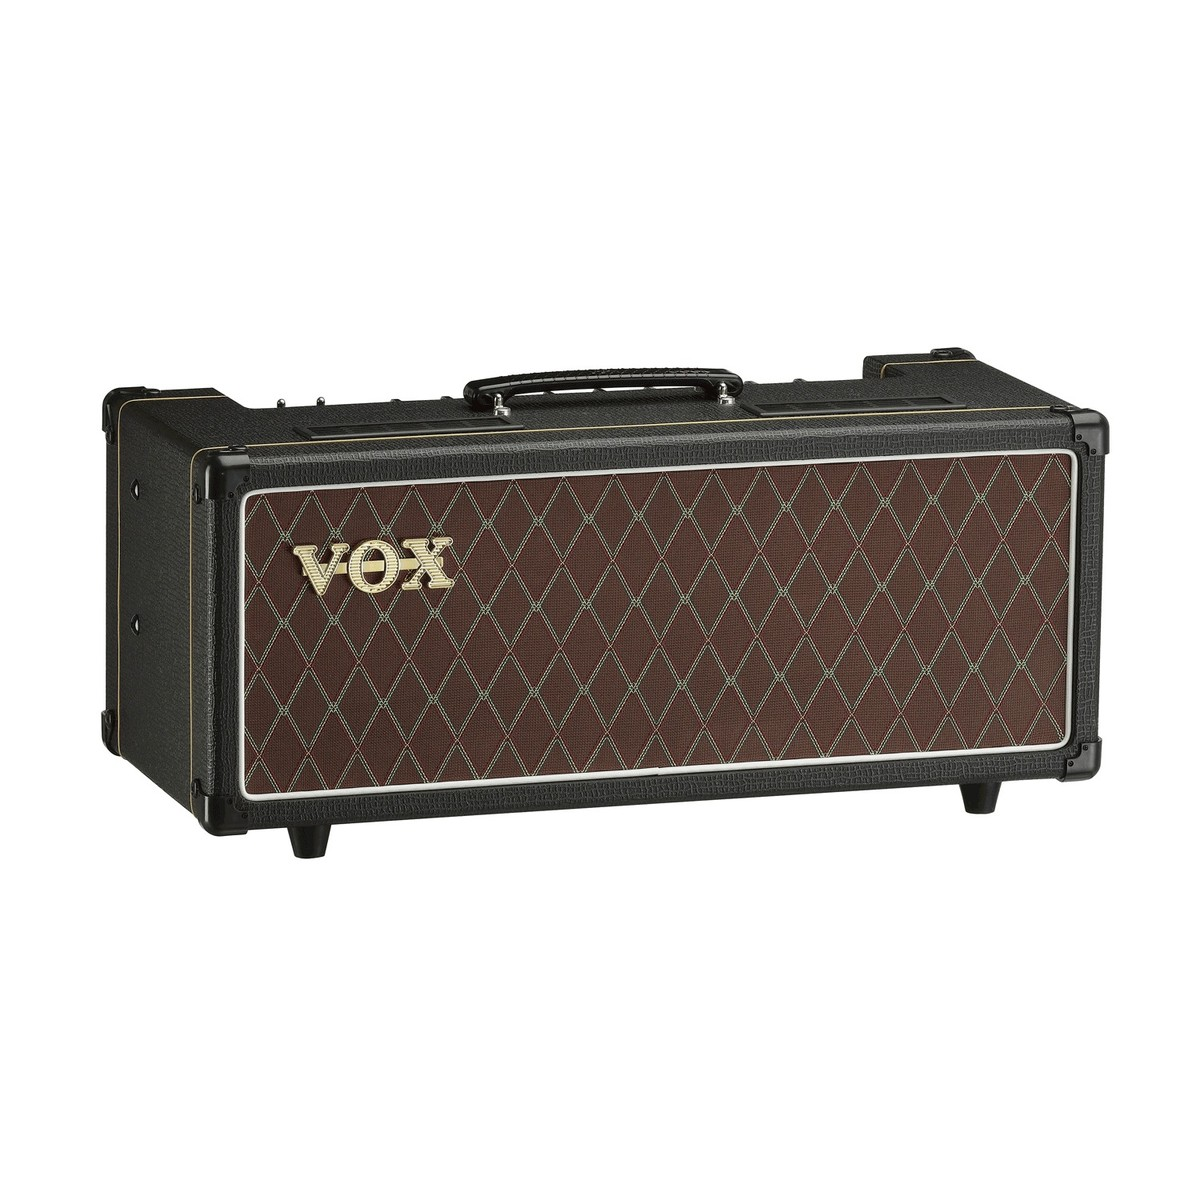 vox amplifier dating